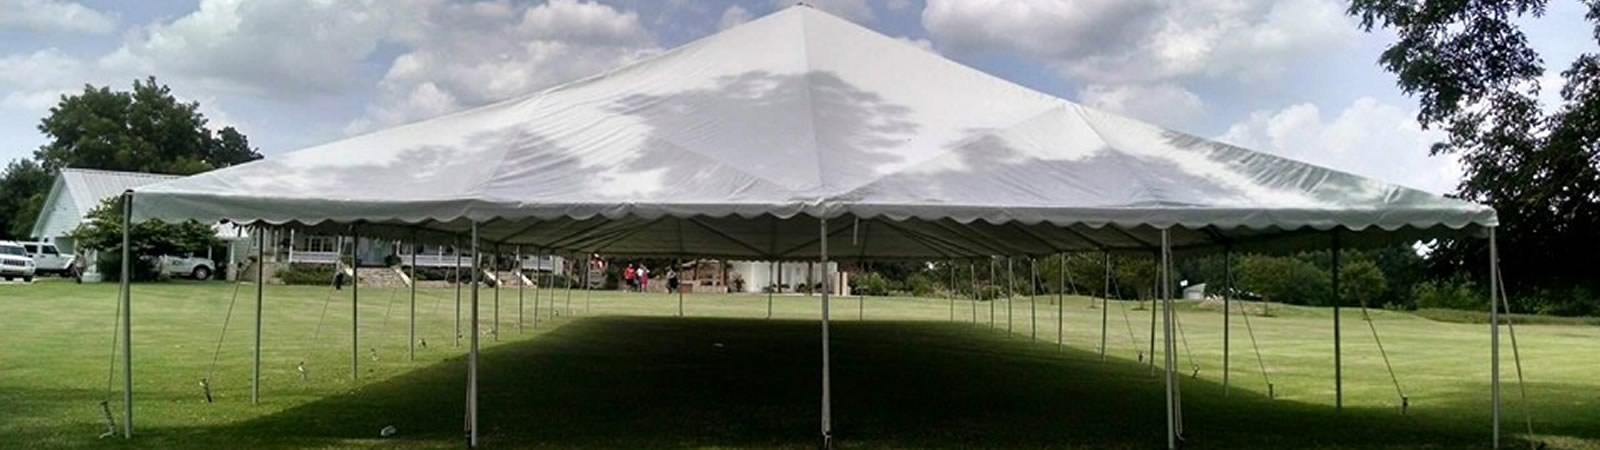 Tents Over Texas Pole And Frame Tent Rentals Brenham Tx